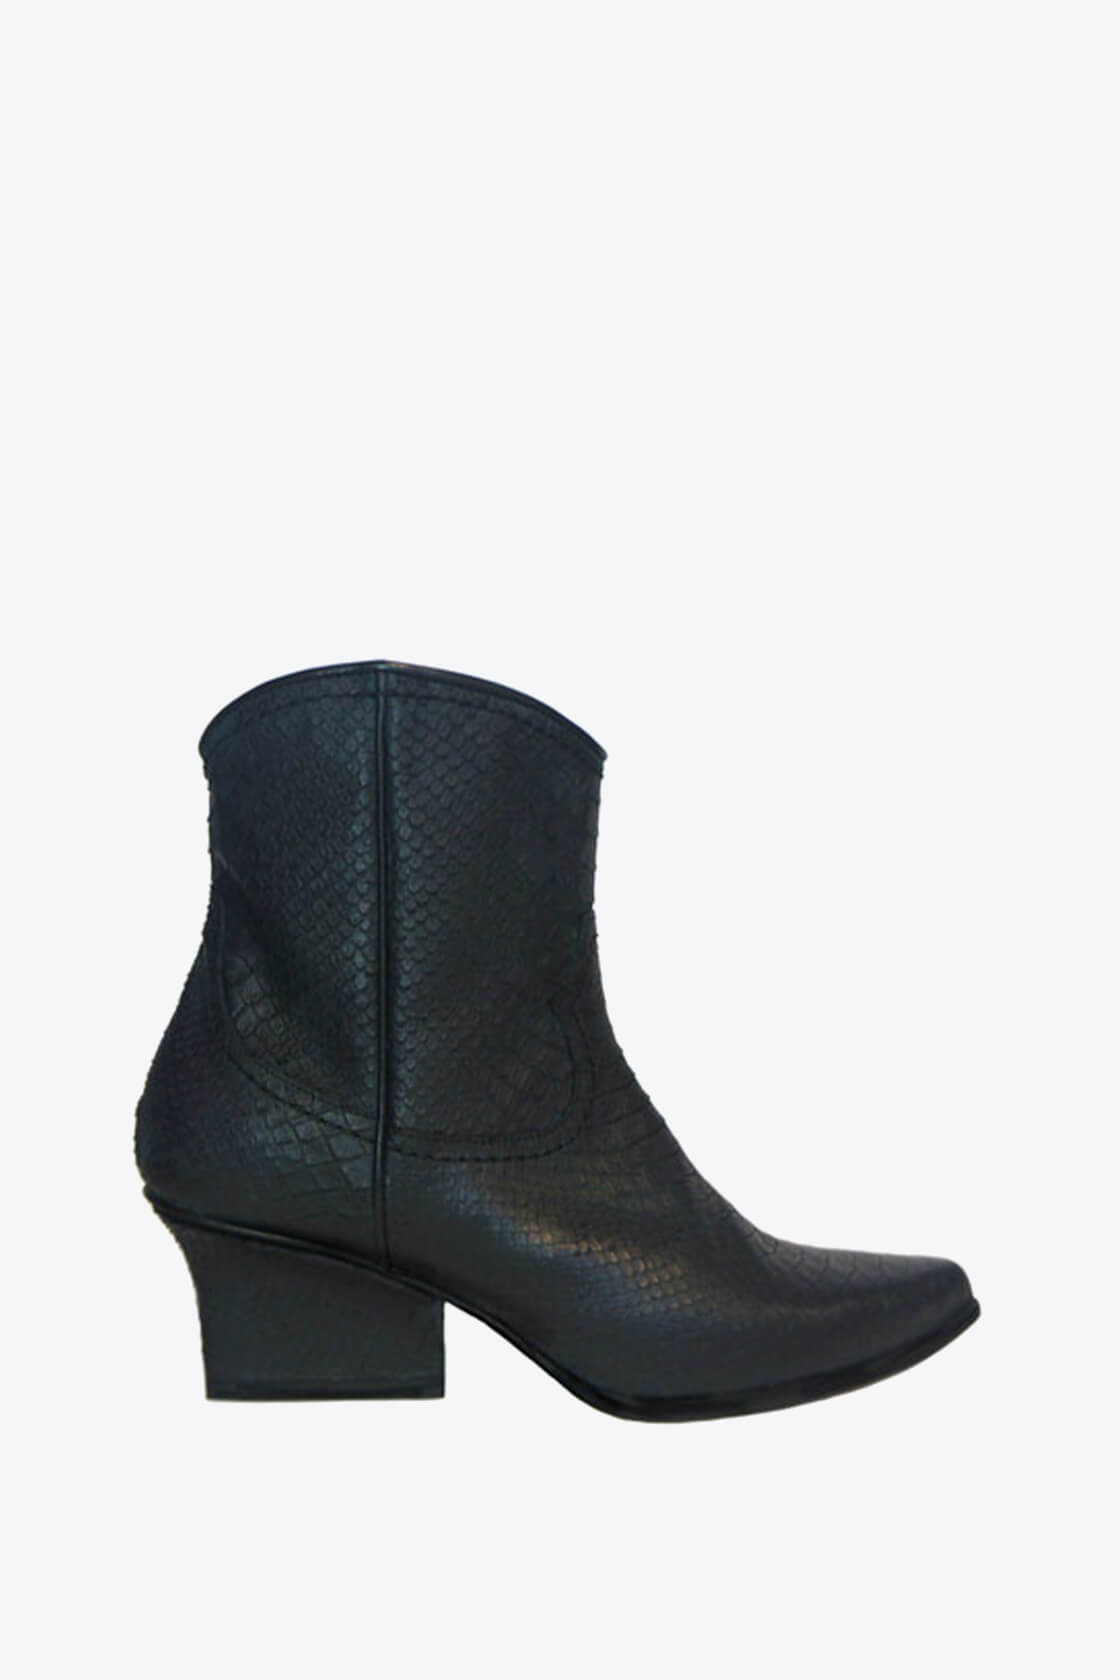 EJK0000030 Abby western boots black python 1